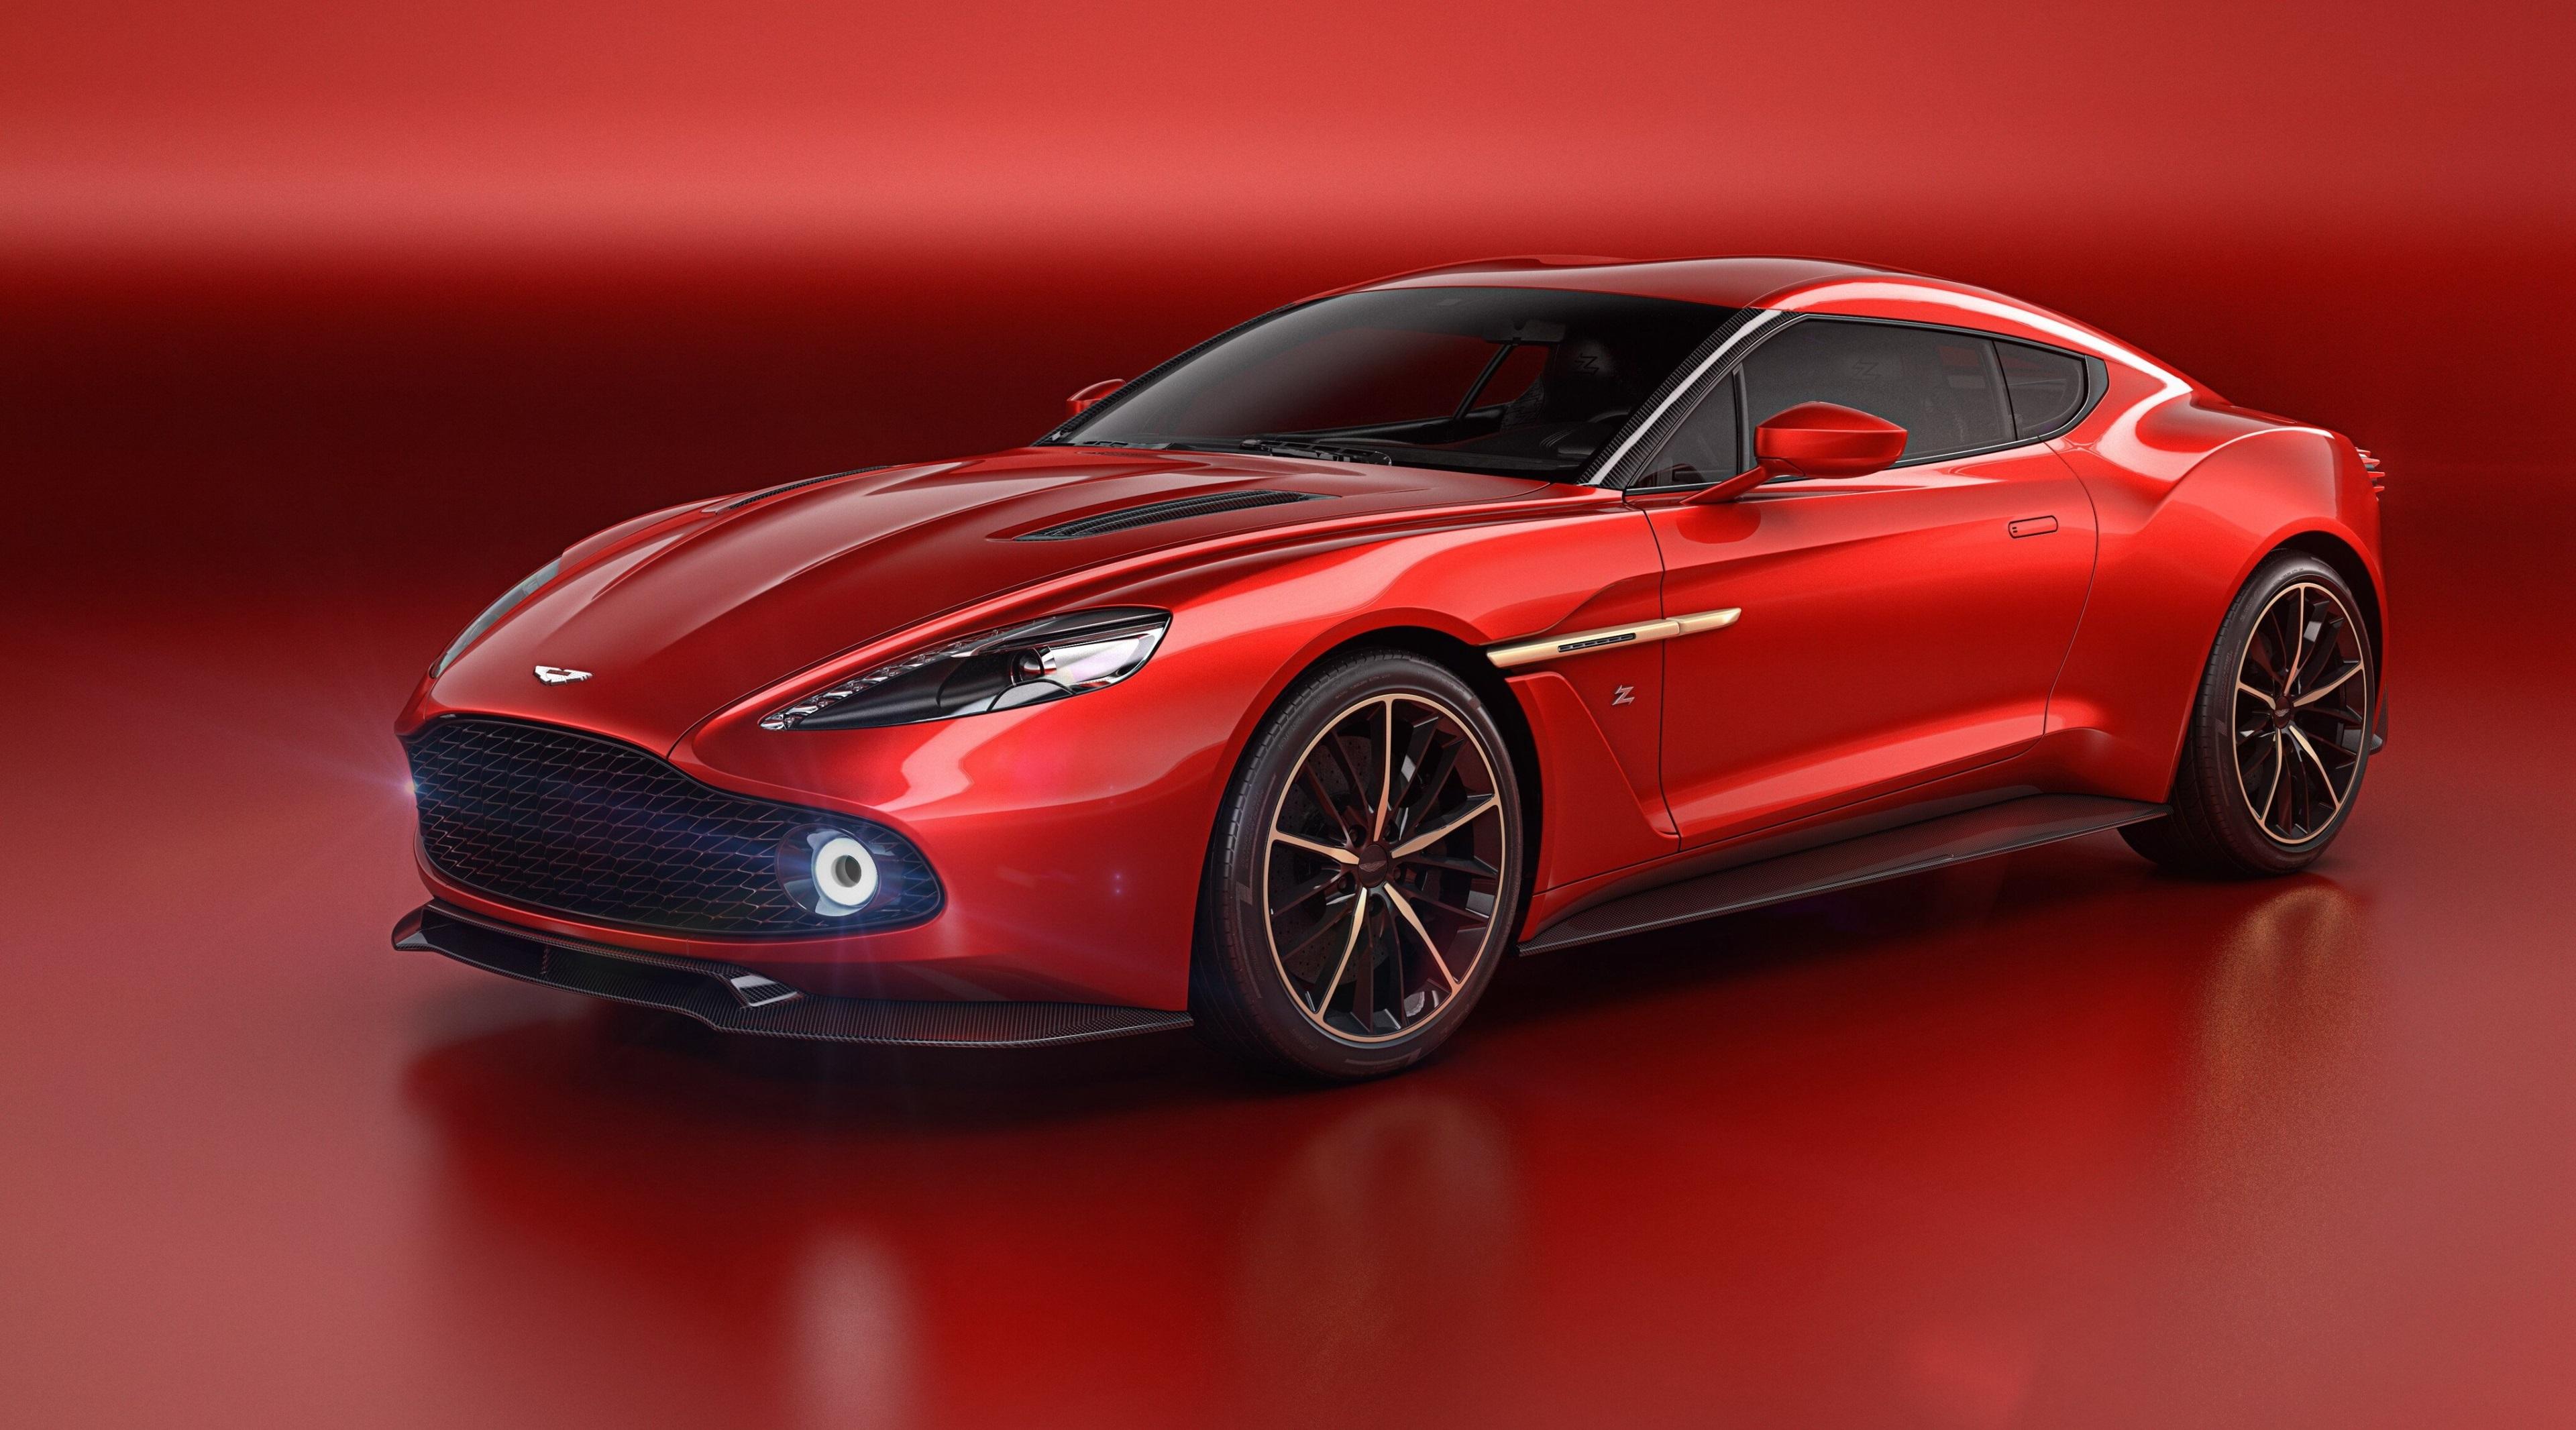 Aston Martin Hd Wallpapers 1080p 3840x2132 Wallpaper Teahub Io